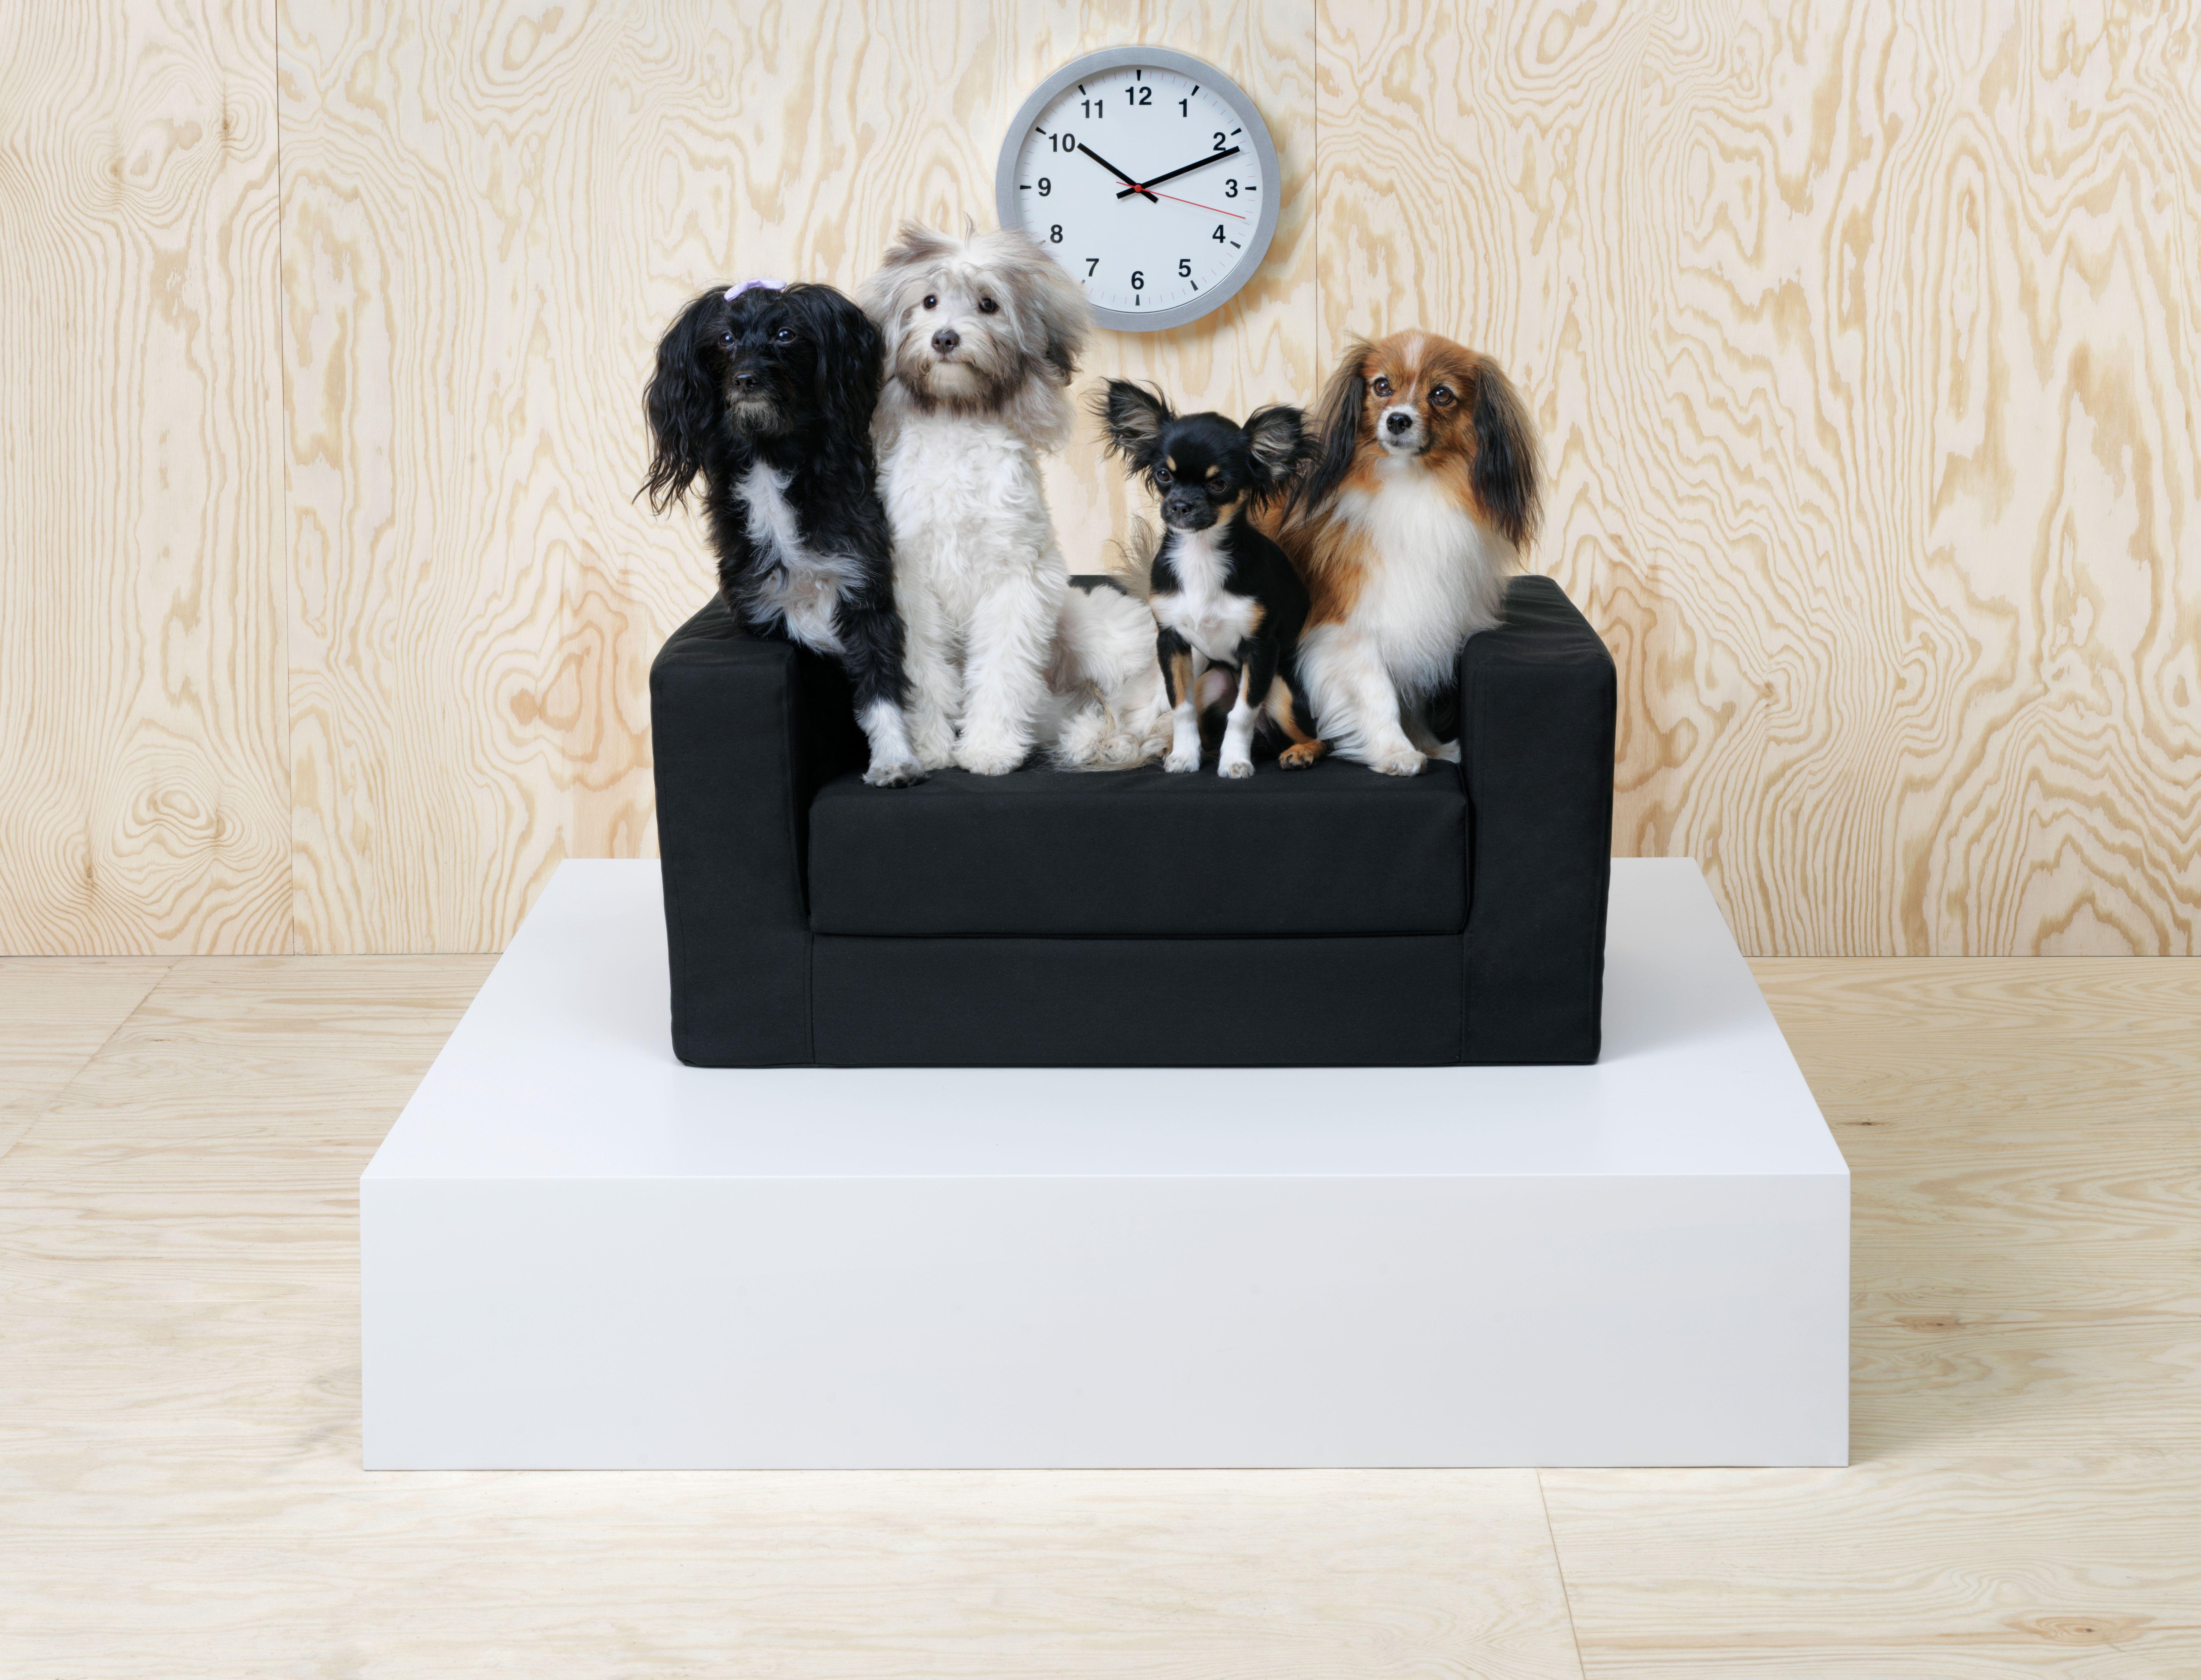 España Colección Para Ikea La De A PrepárateLlega Mascotas tQCdsrhx